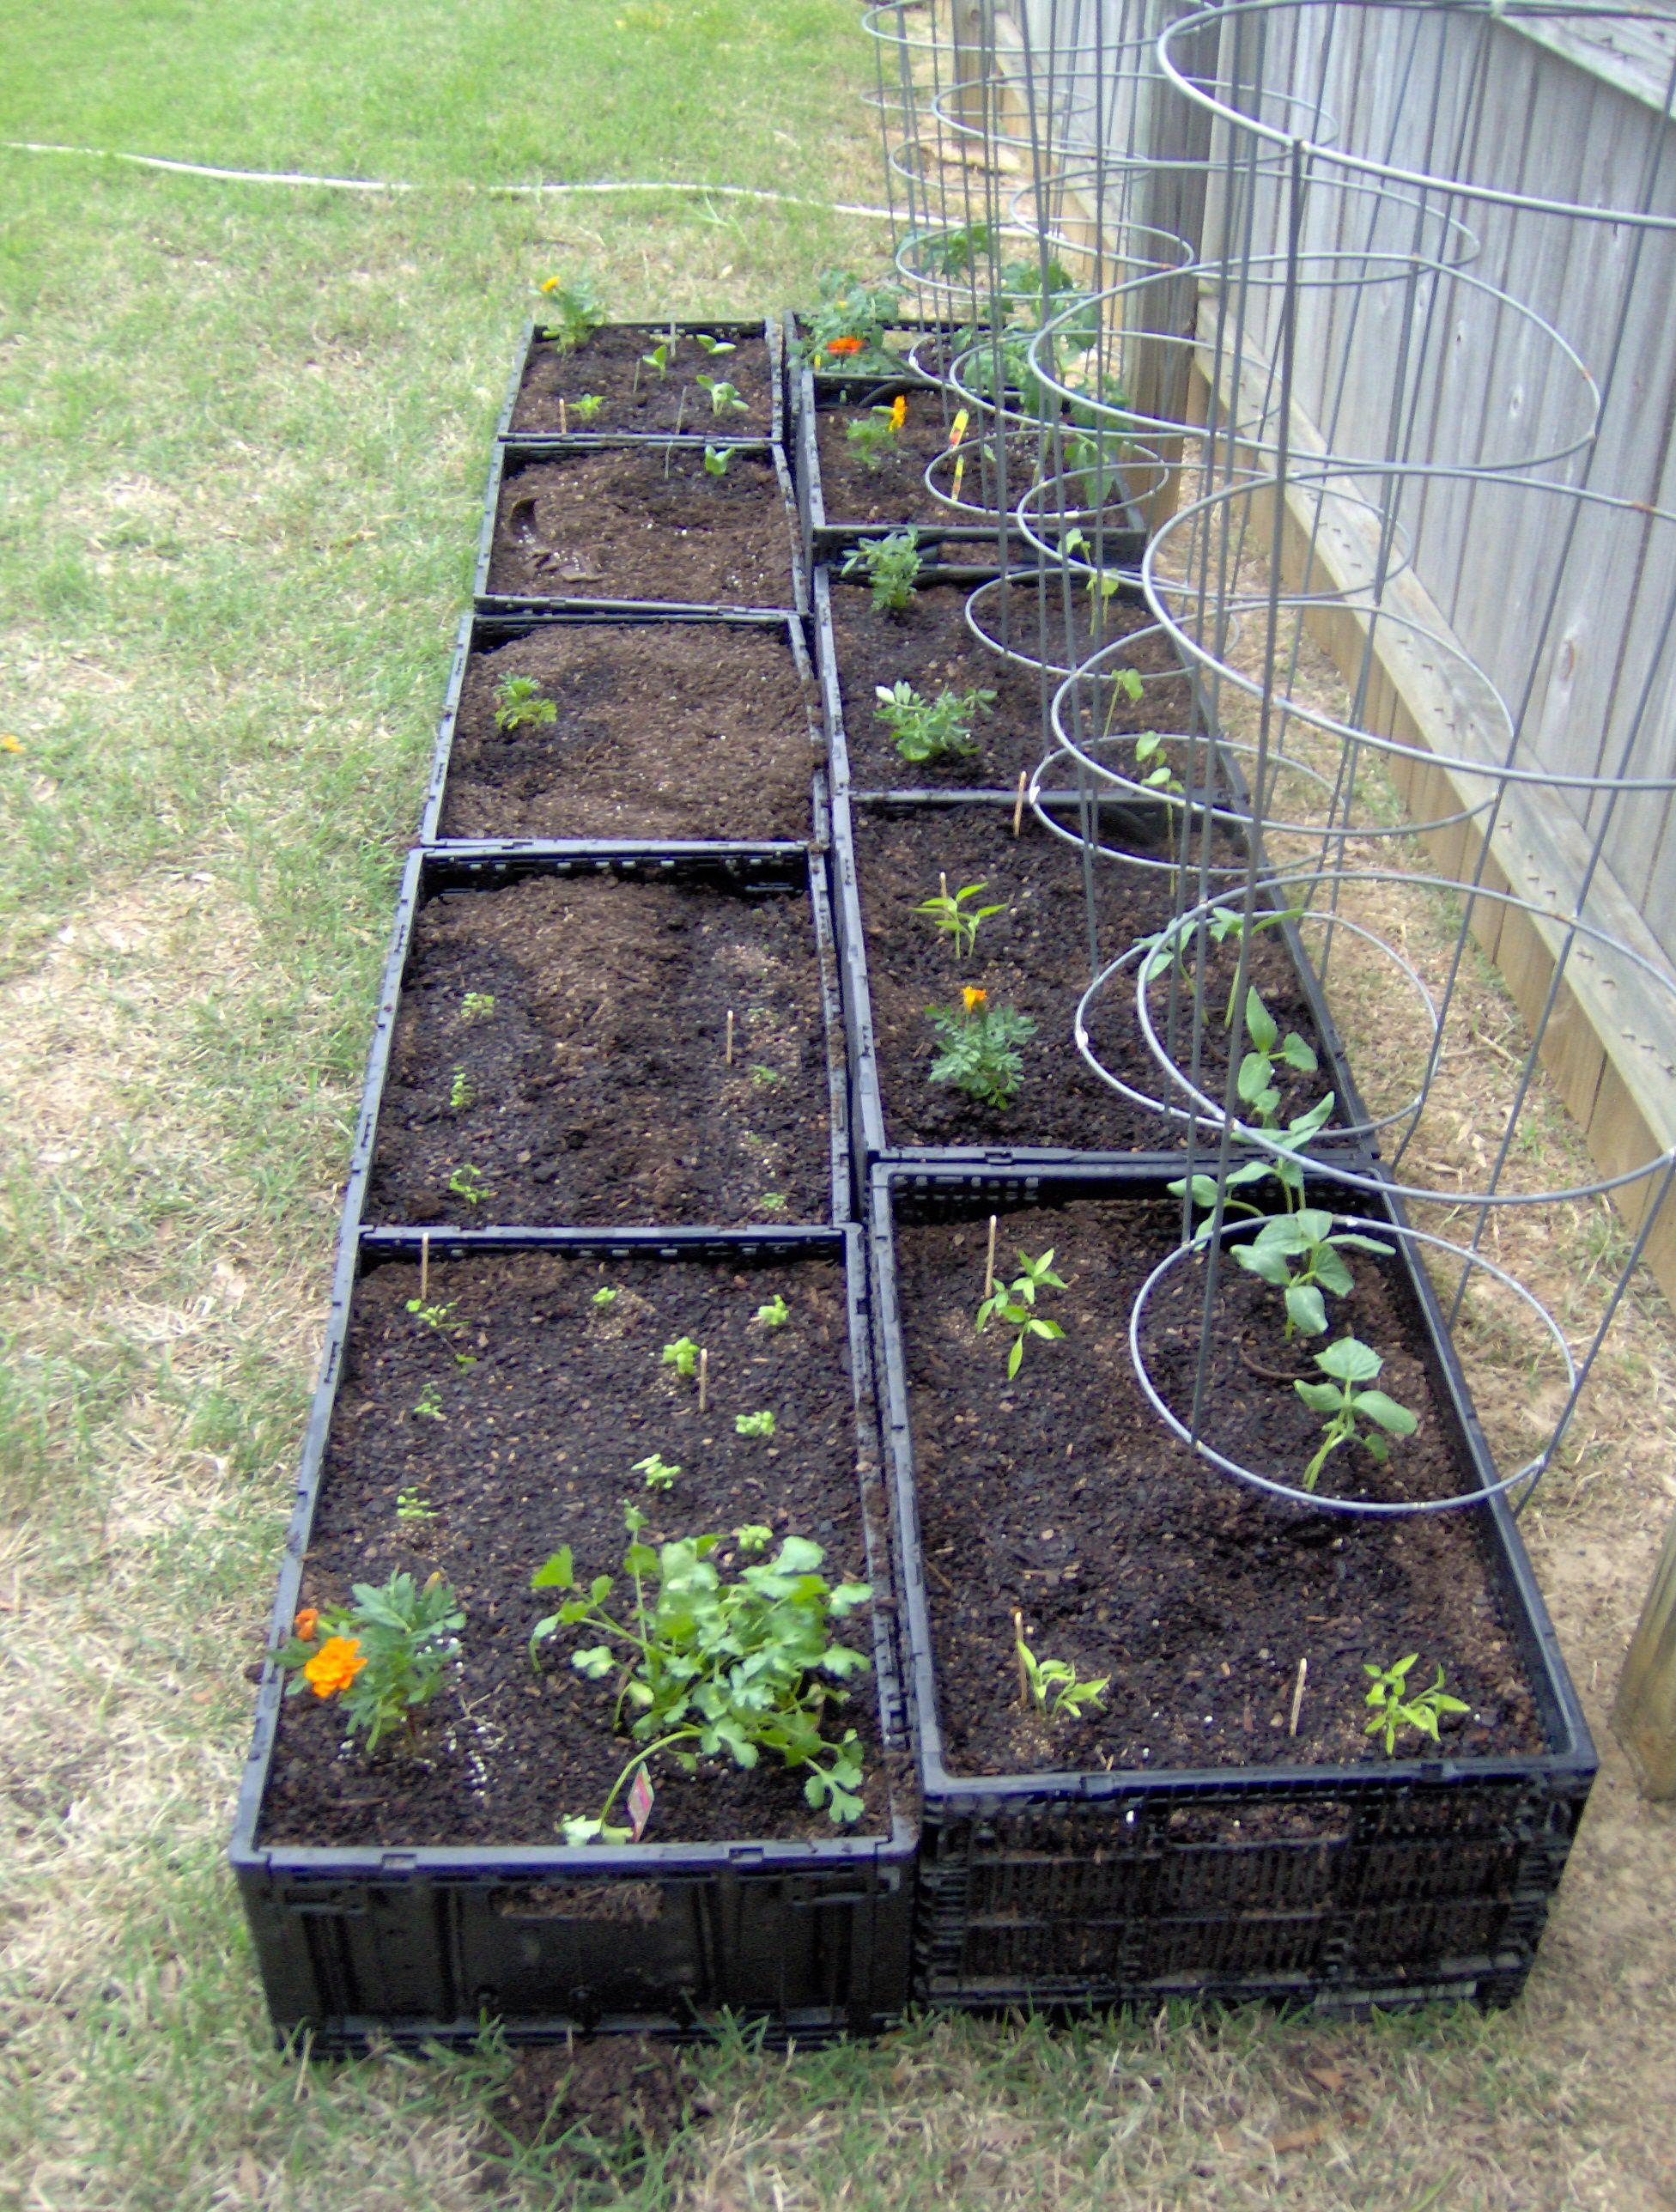 My Free Square Foot Garden Diy Raised Garden Building A Raised Garden Raised Garden